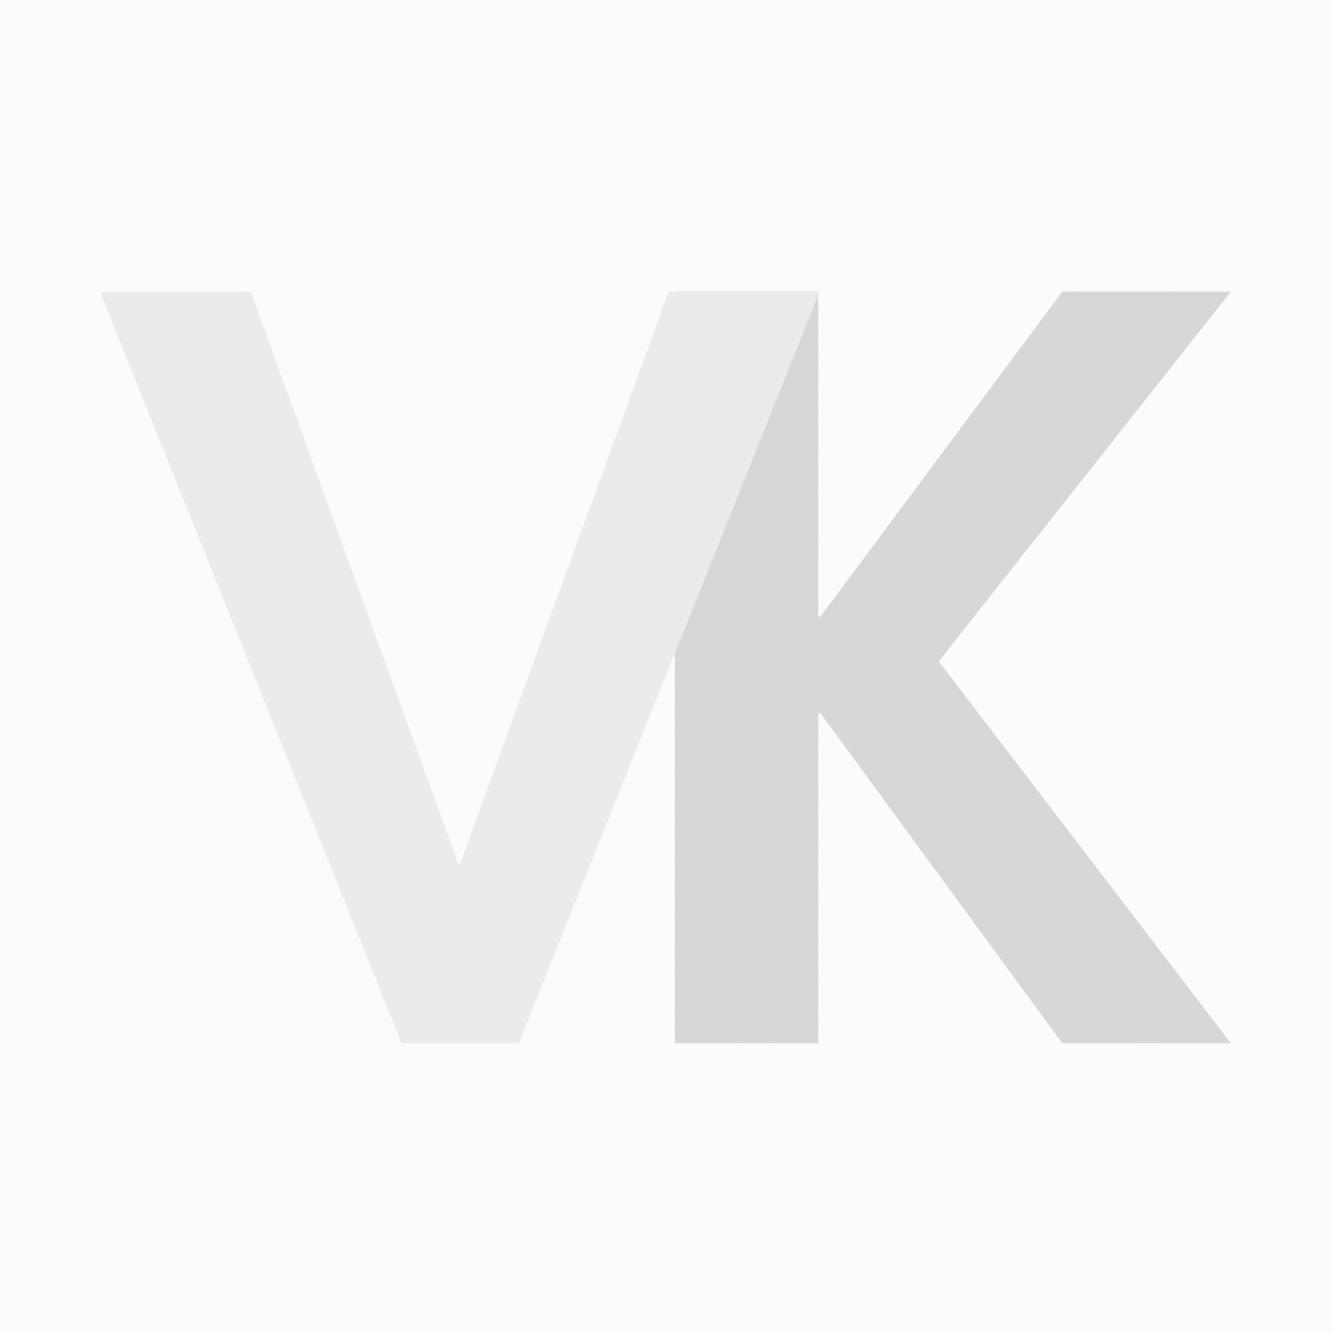 Wahl Premium Opzetkamset 10st. 1.5 t/m 25mm Blisterverpakking